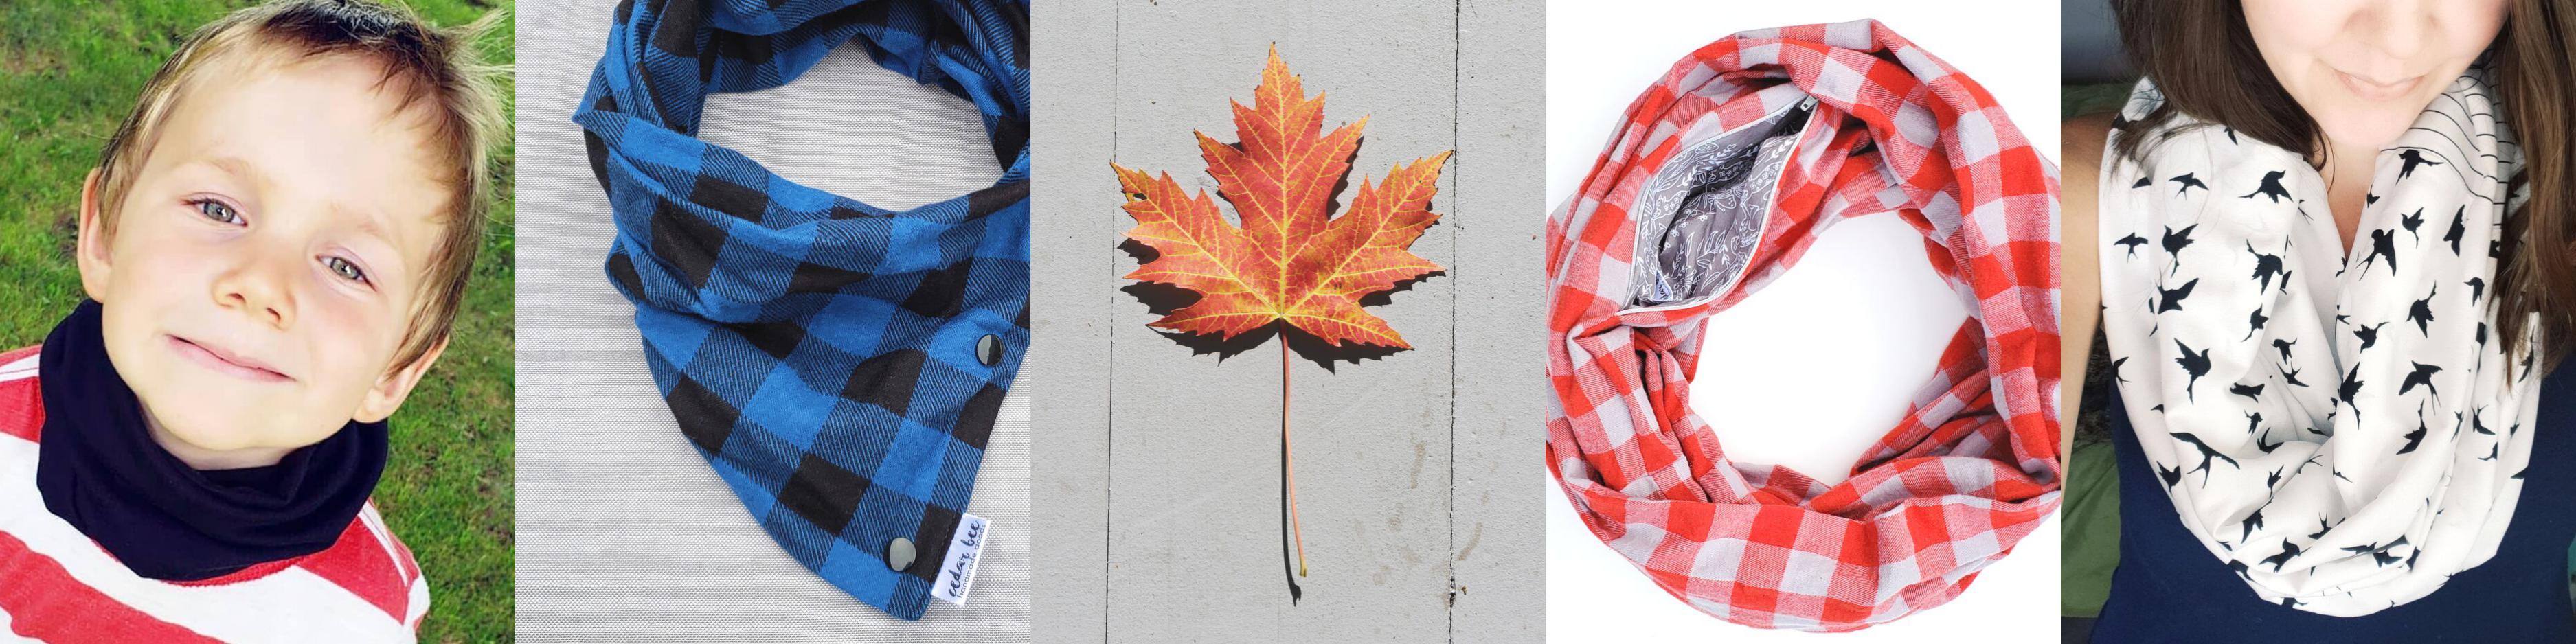 Snap scarves for kids and pocket scarves for you